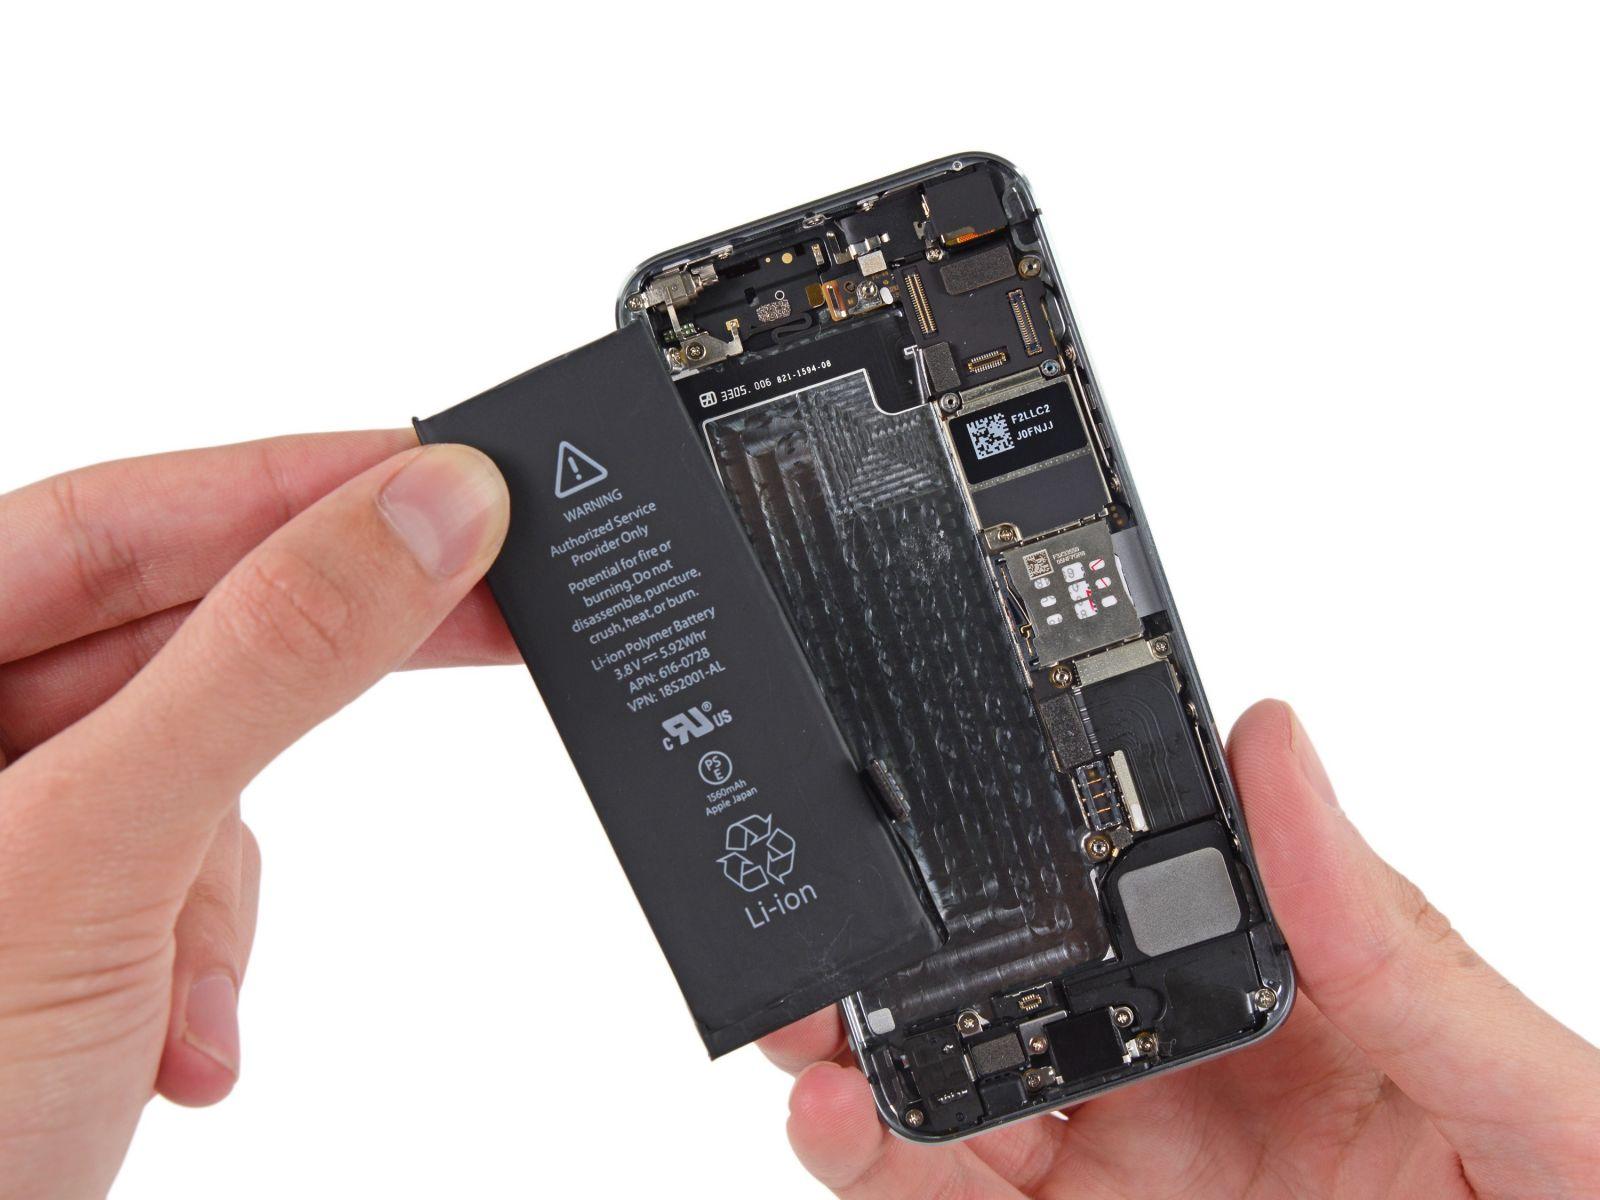 Замета аккумулятора на iPhone 5S (45)